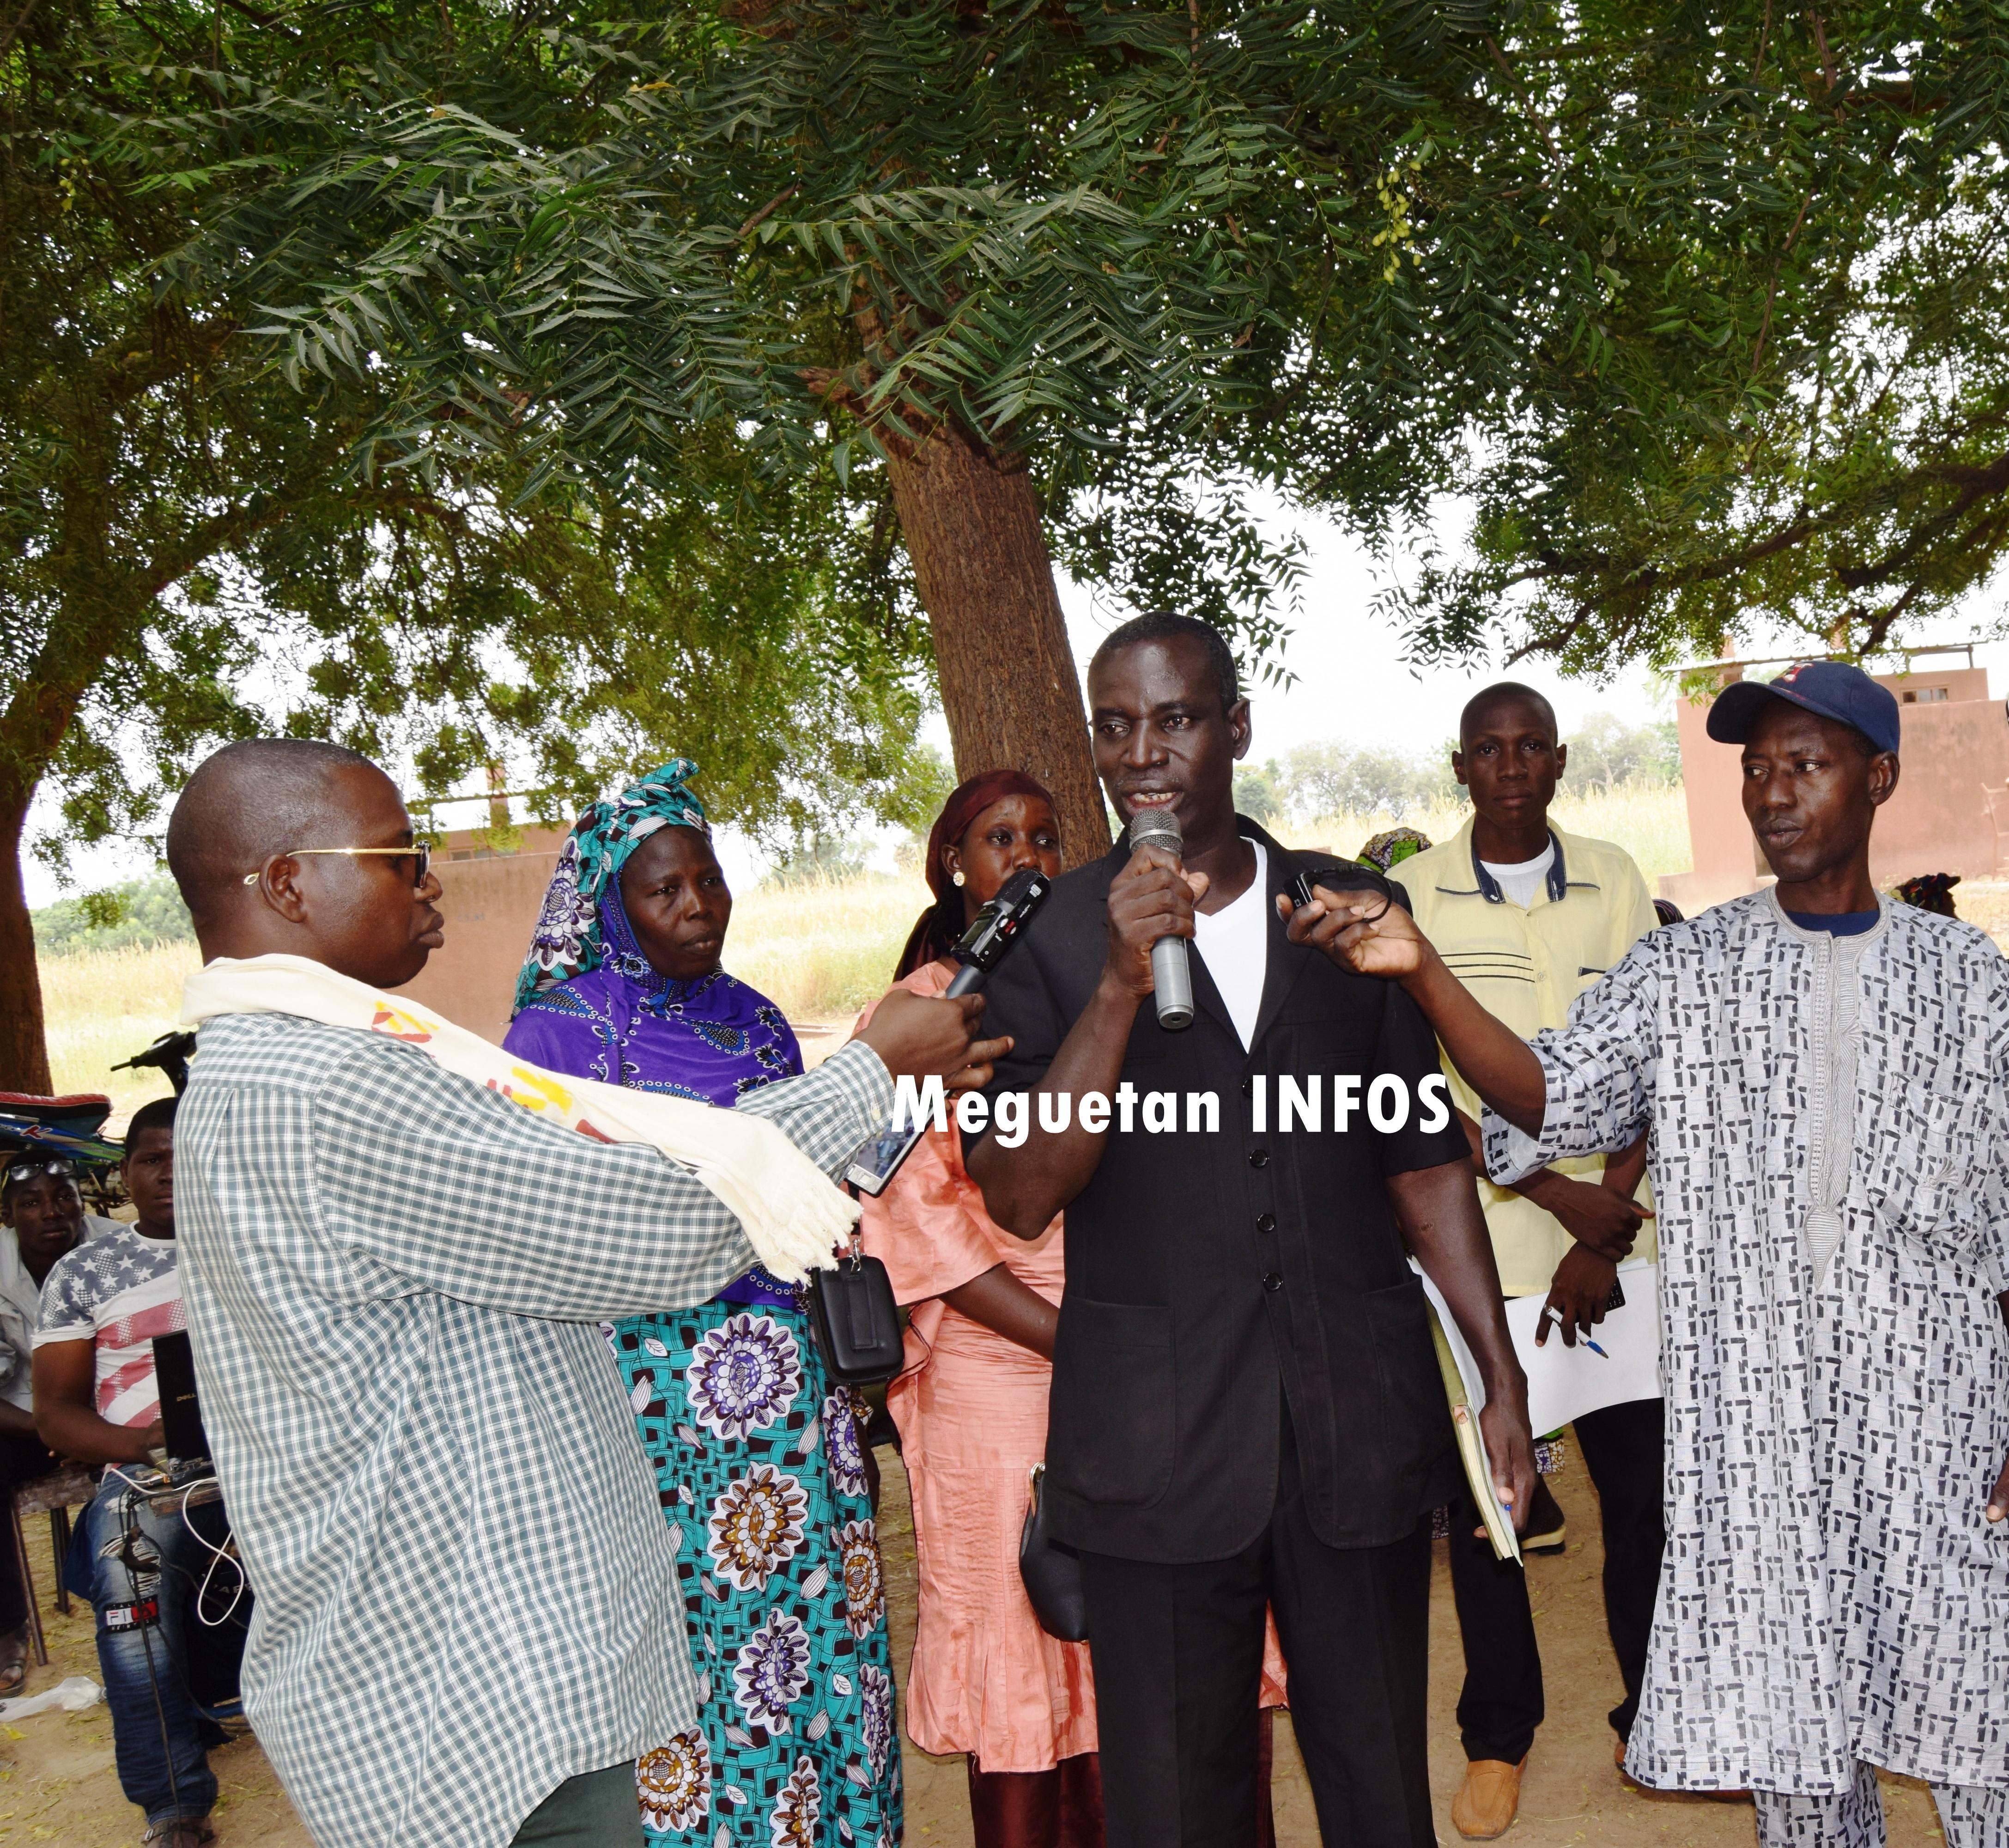 Maire-commune-rurale-Sirakorola-Souleymane-Coulibaly-Tostan-Koulikoro